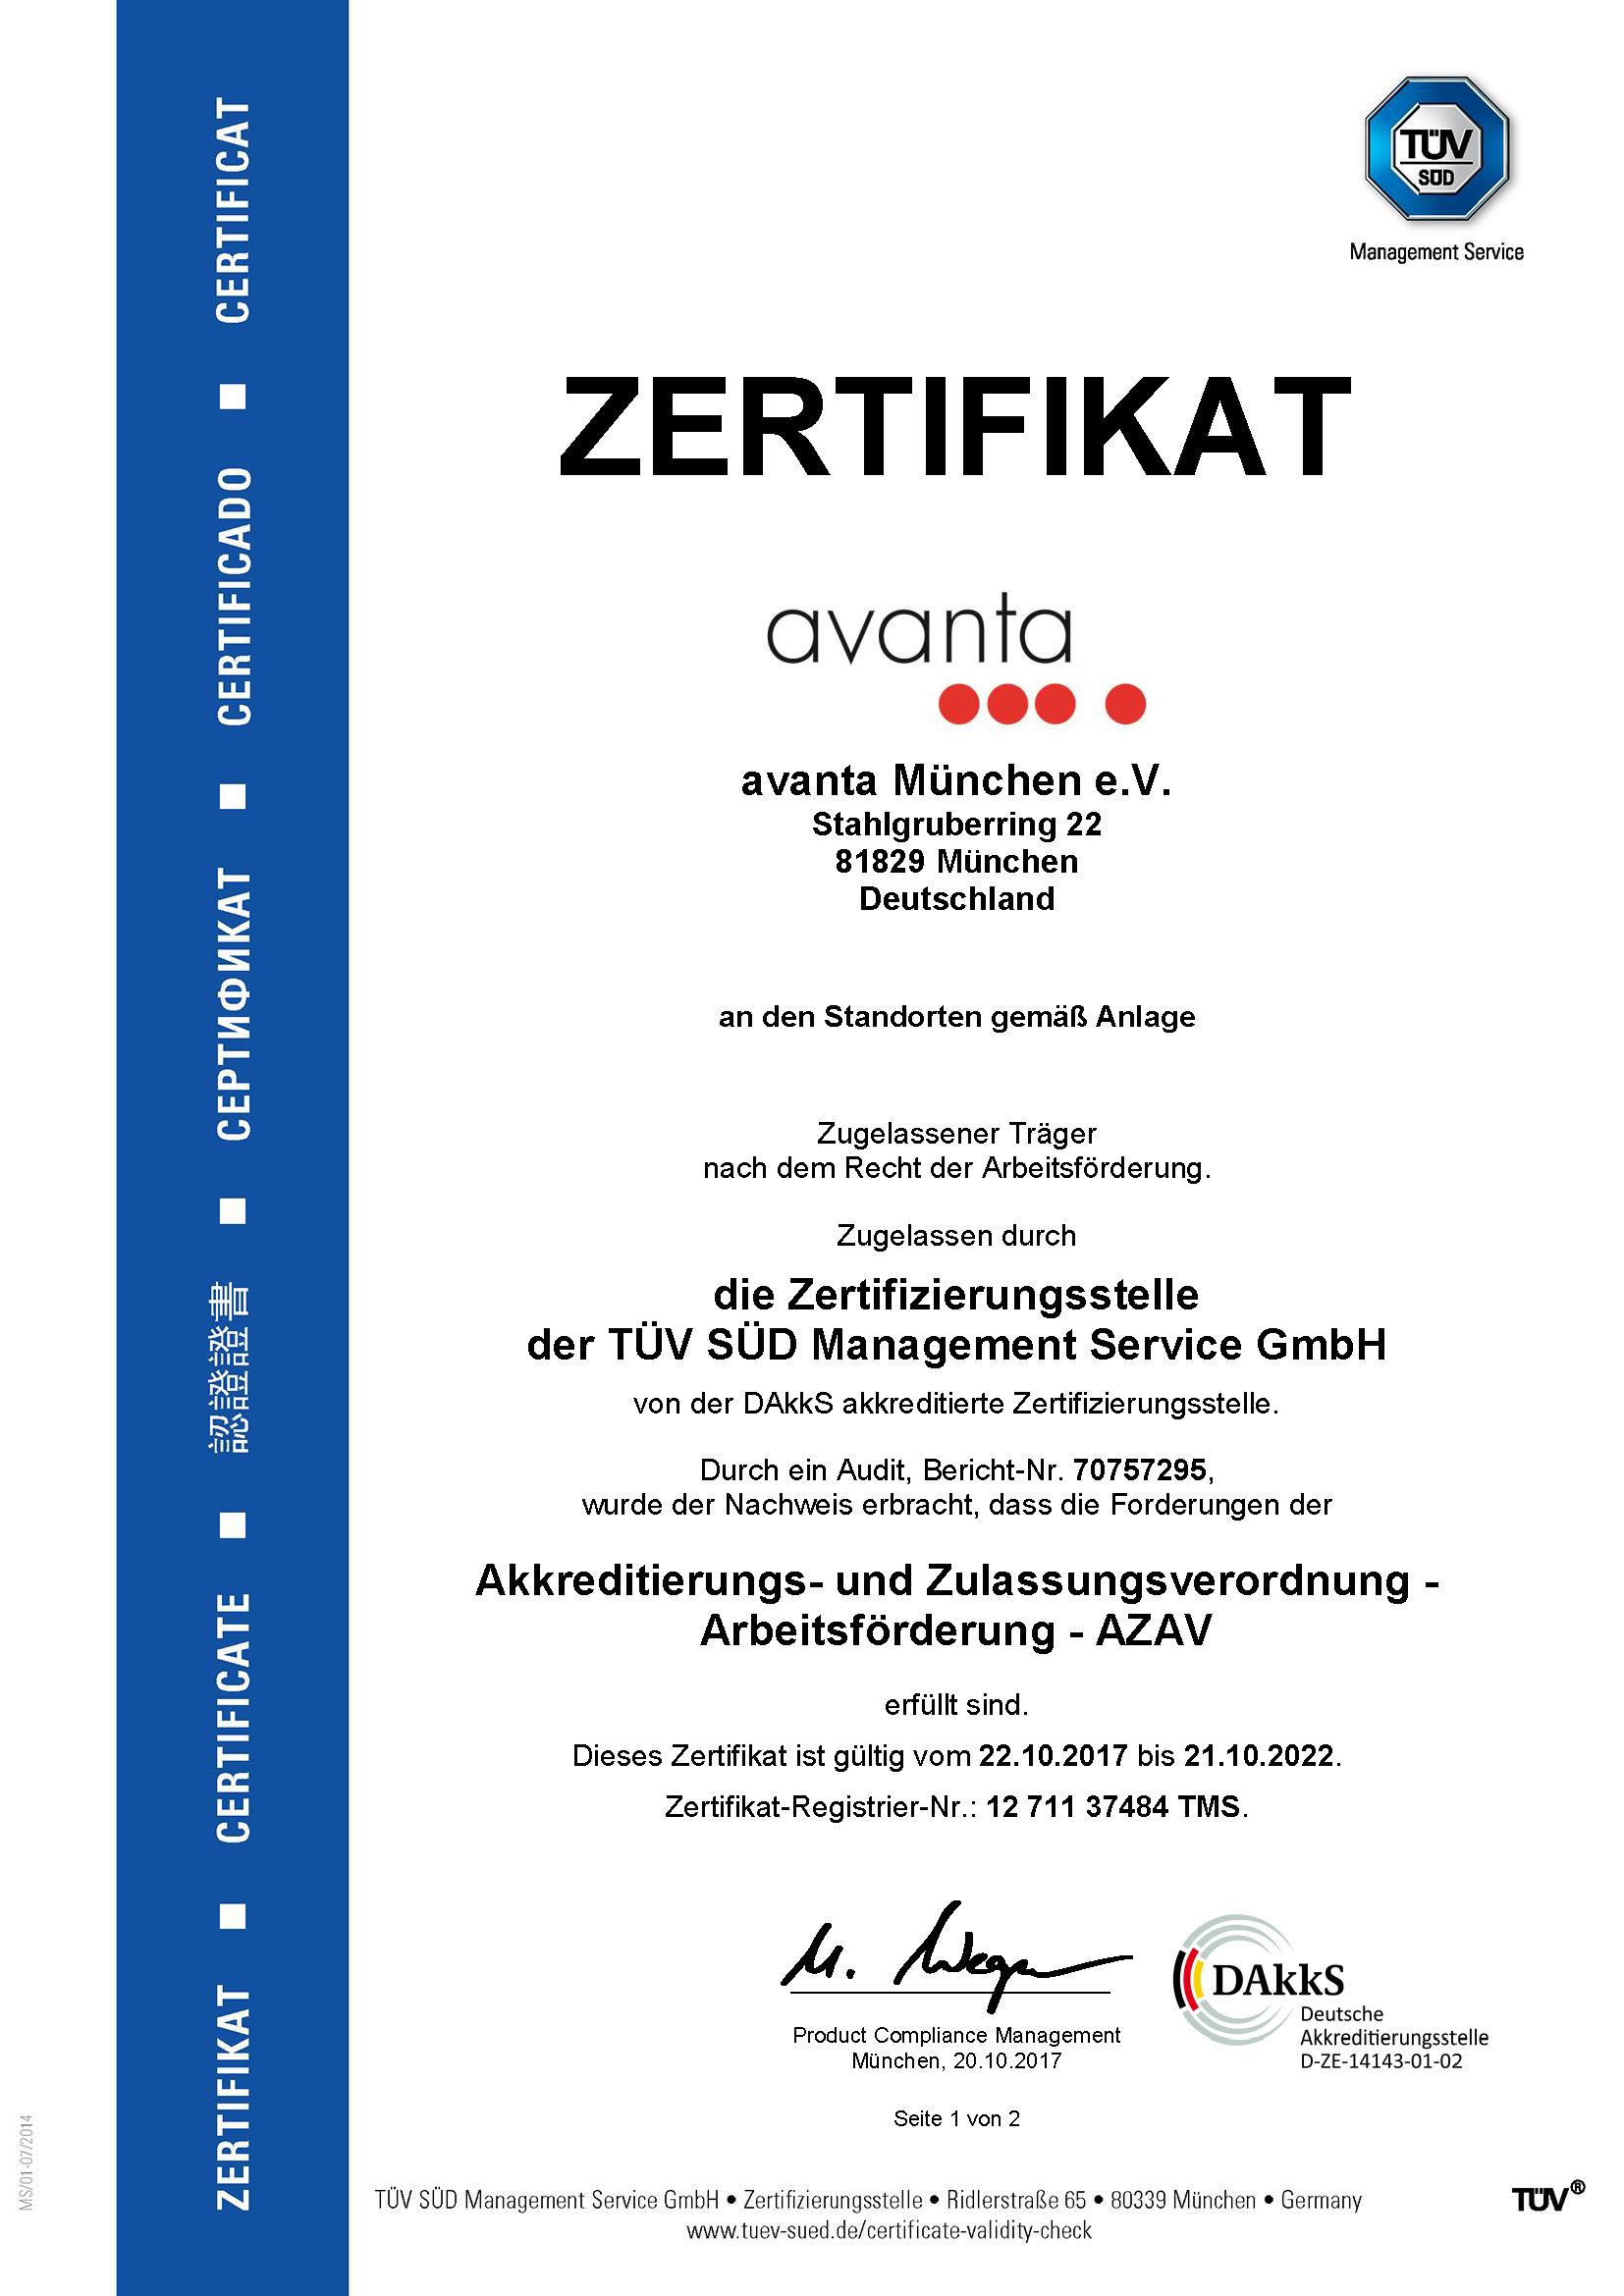 TÜV_Zertifikat_AZAV_10-2017_Seite_1